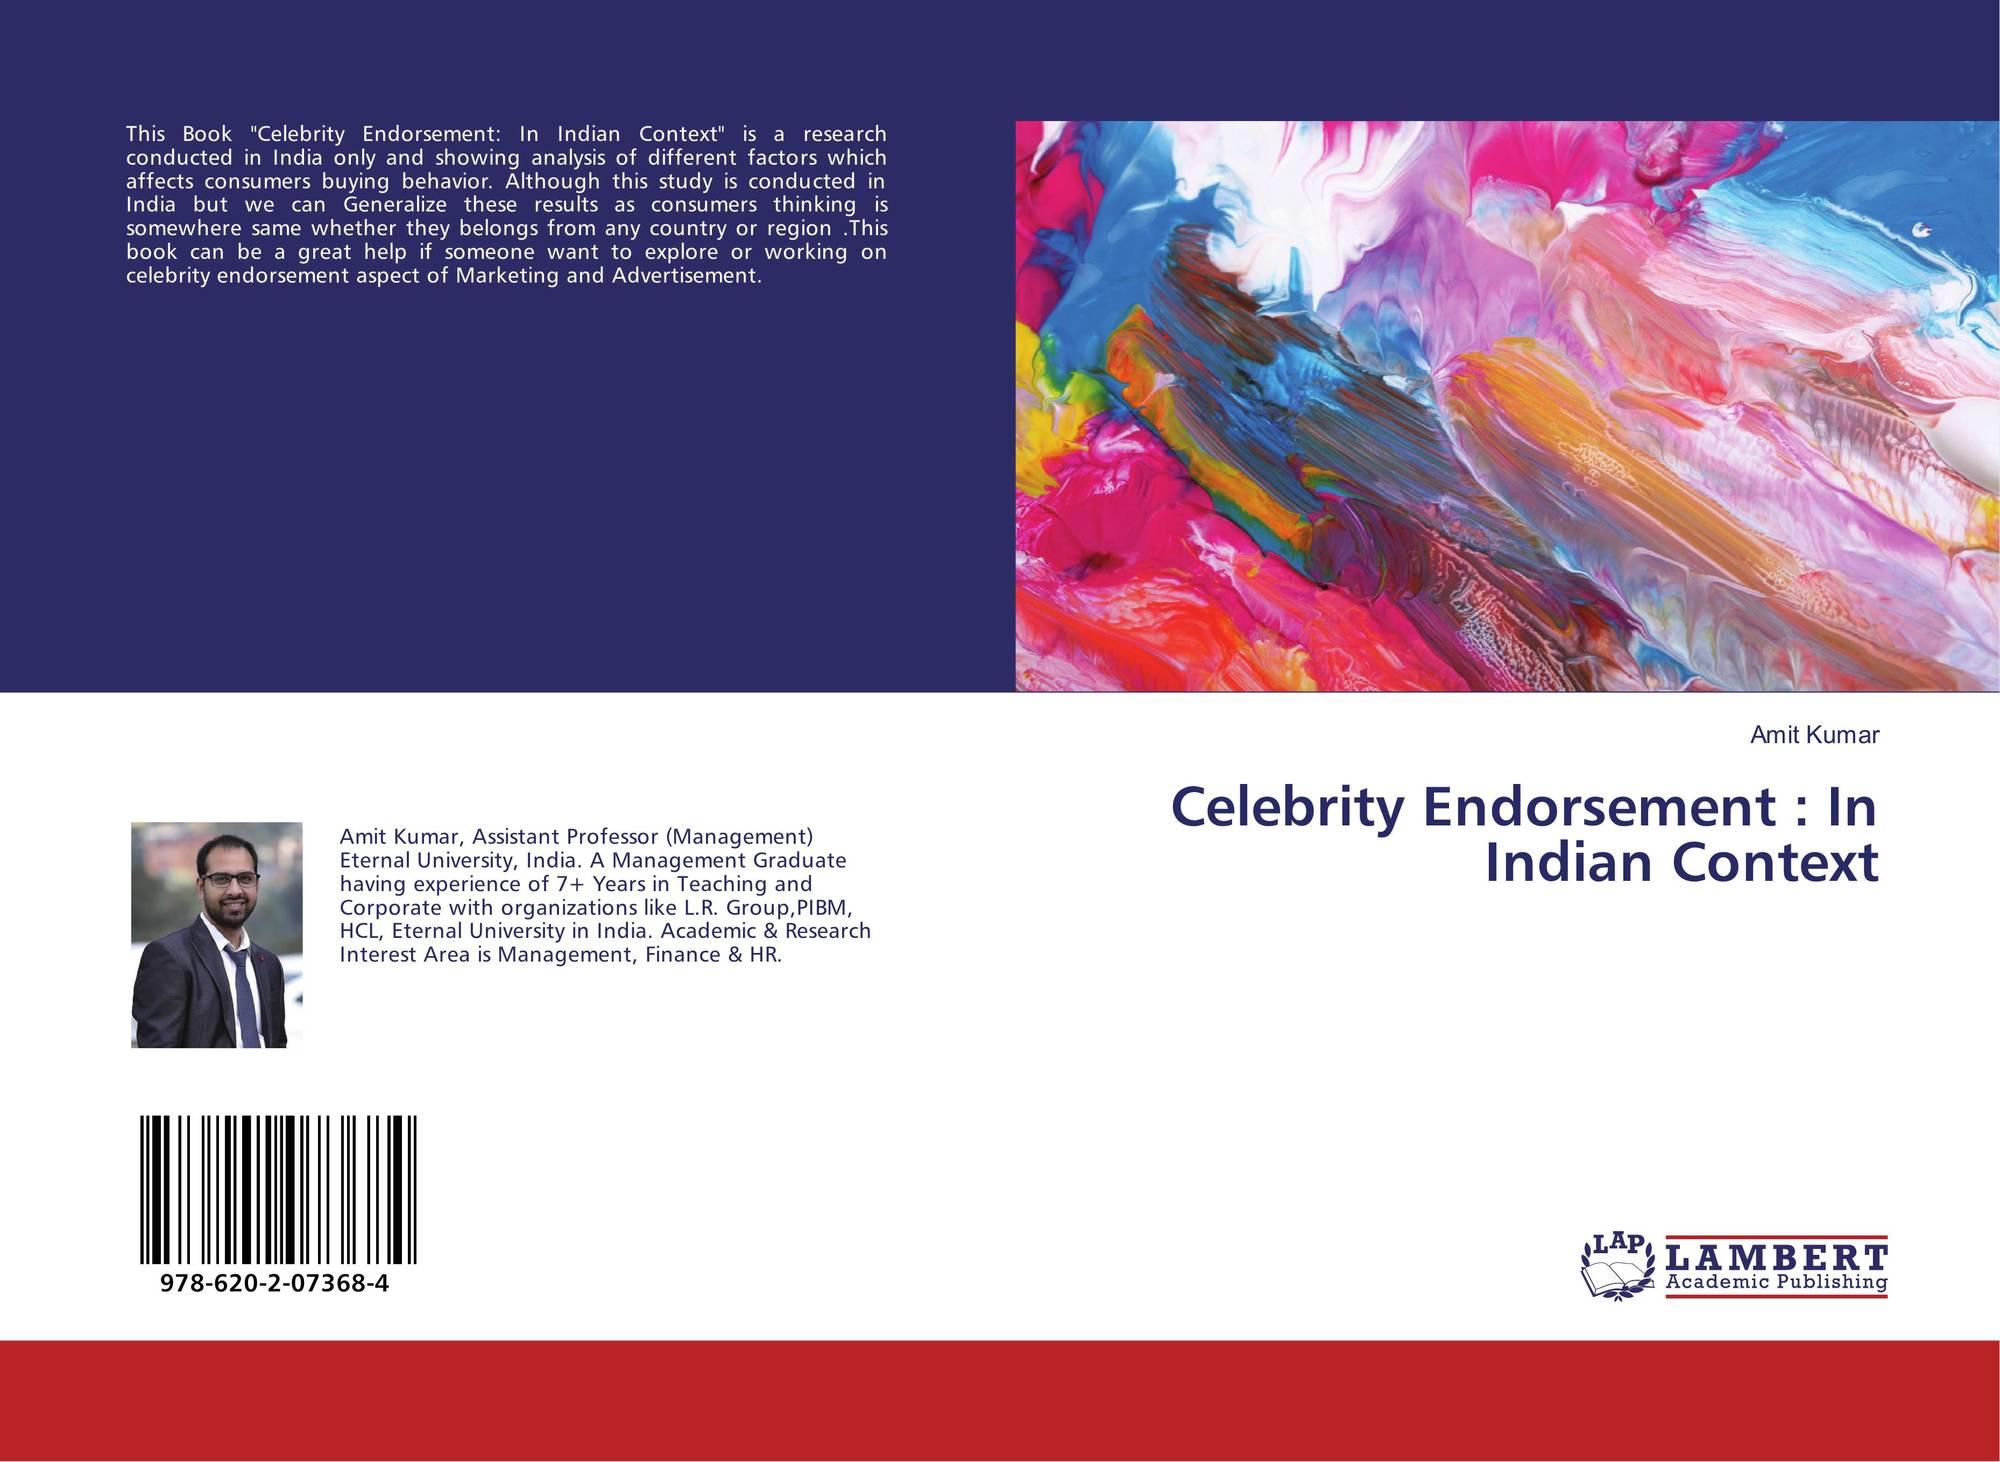 celebrity endorsement on consumer buying behaviour